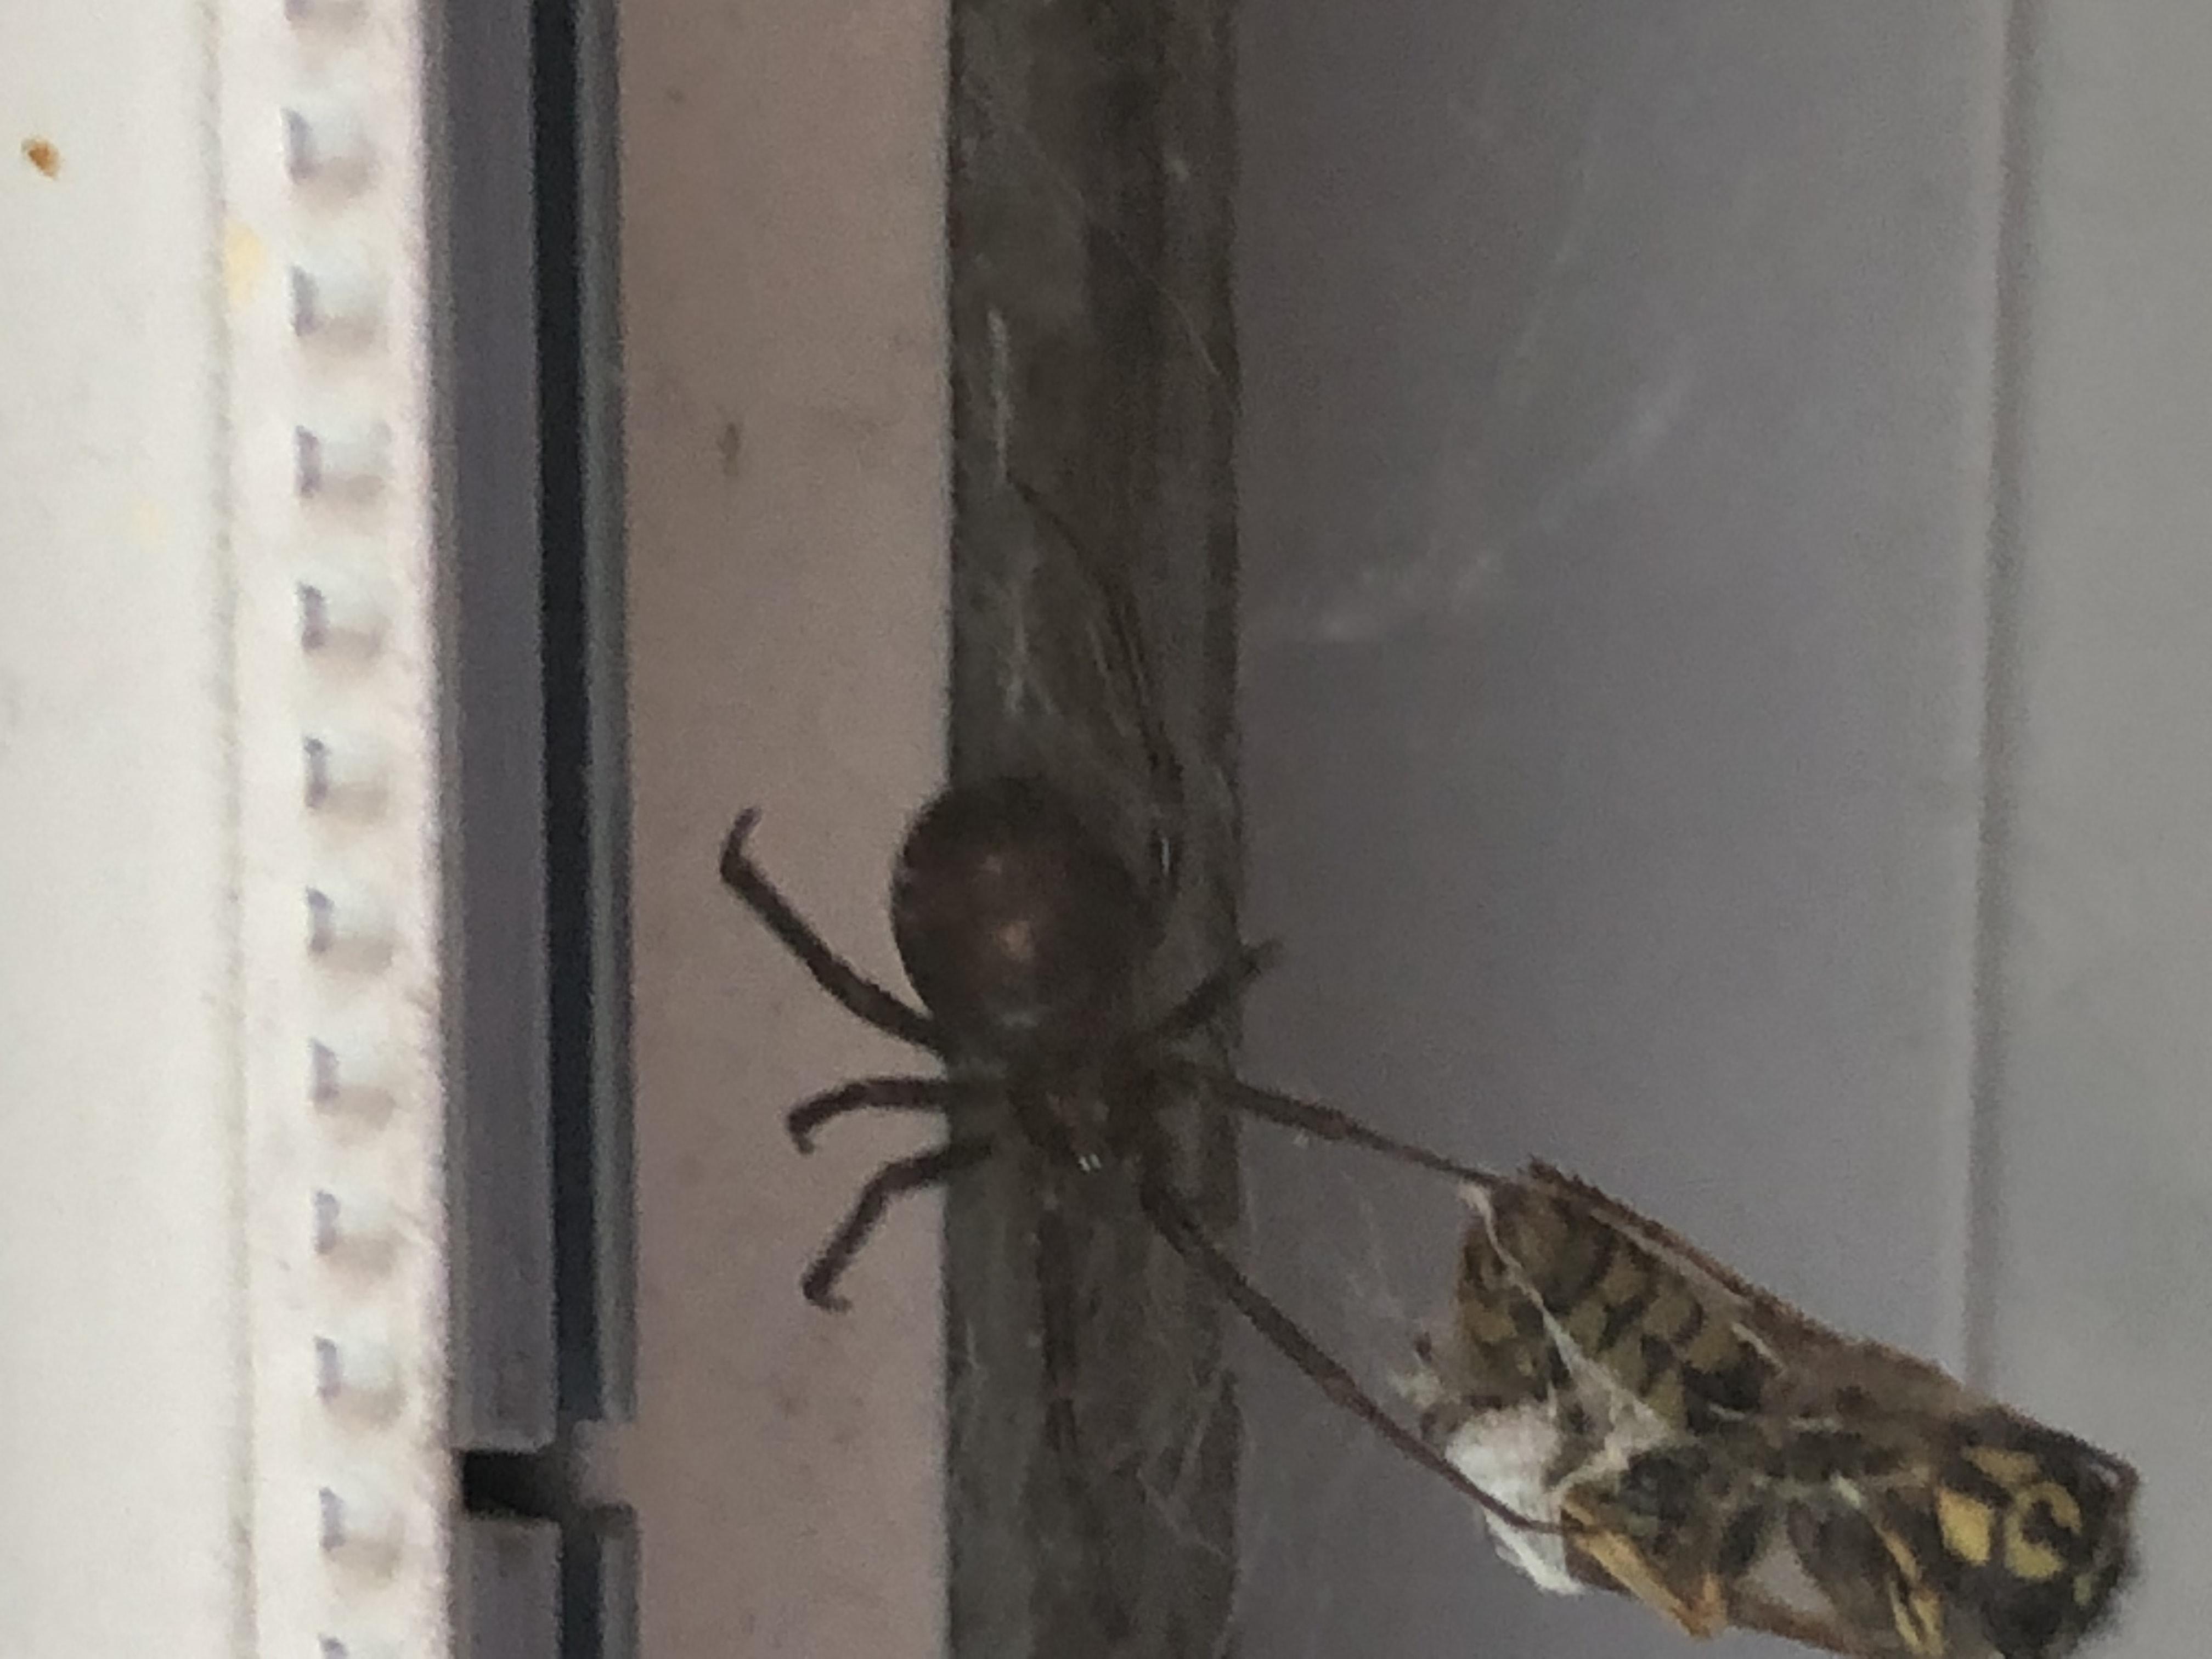 Picture of Steatoda grossa (False Black Widow) - Dorsal,Webs,Prey